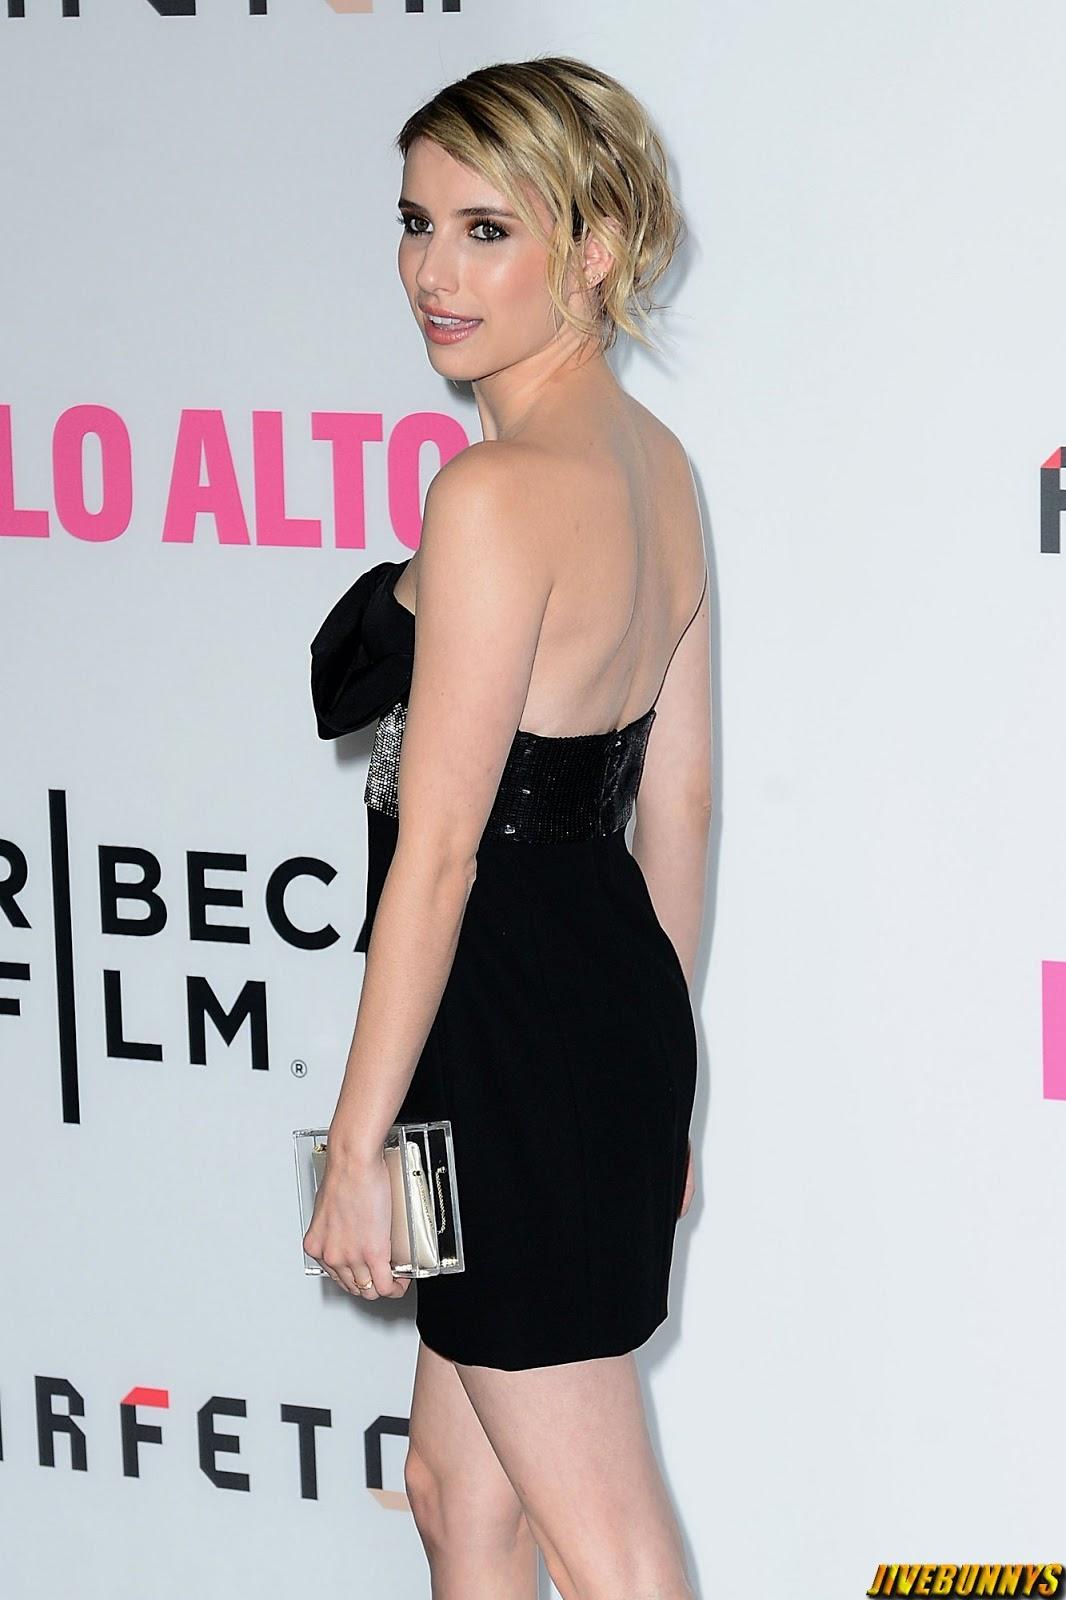 Jivebunnys Female Celebrity Picture Gallery: Emma Roberts Hot Photos ...